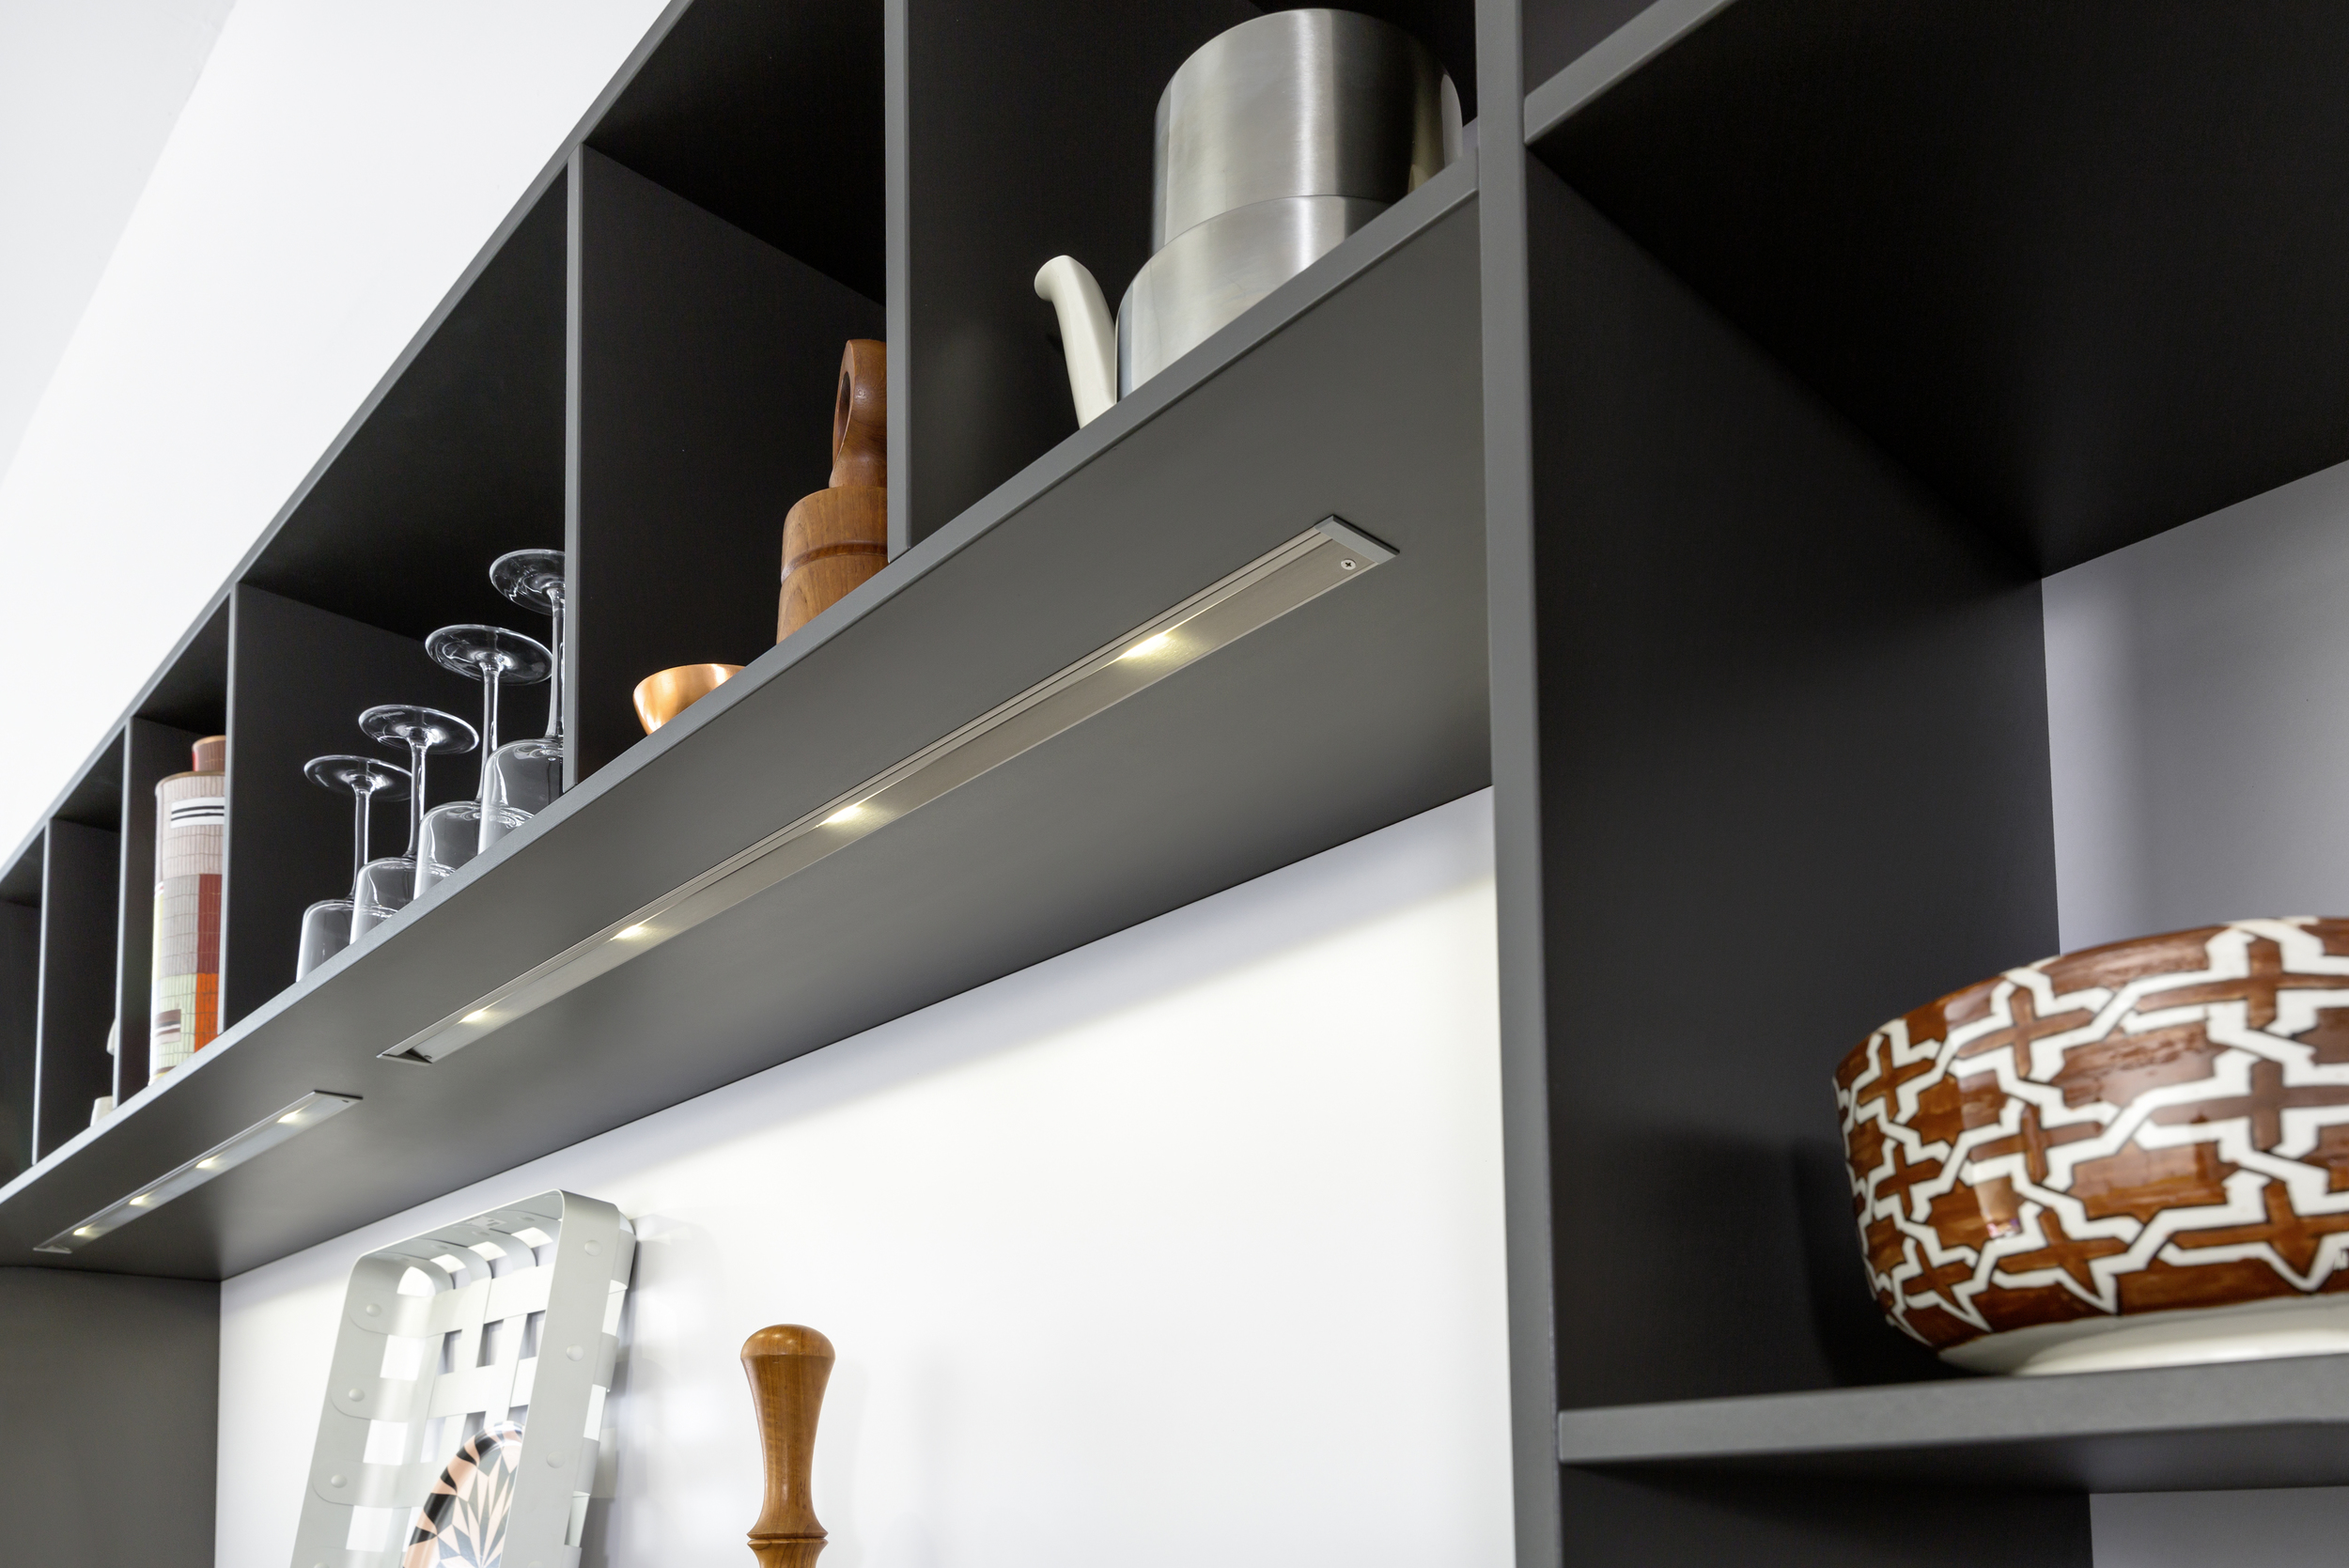 Contour Kitchens Cheltenham - Integrated lighting